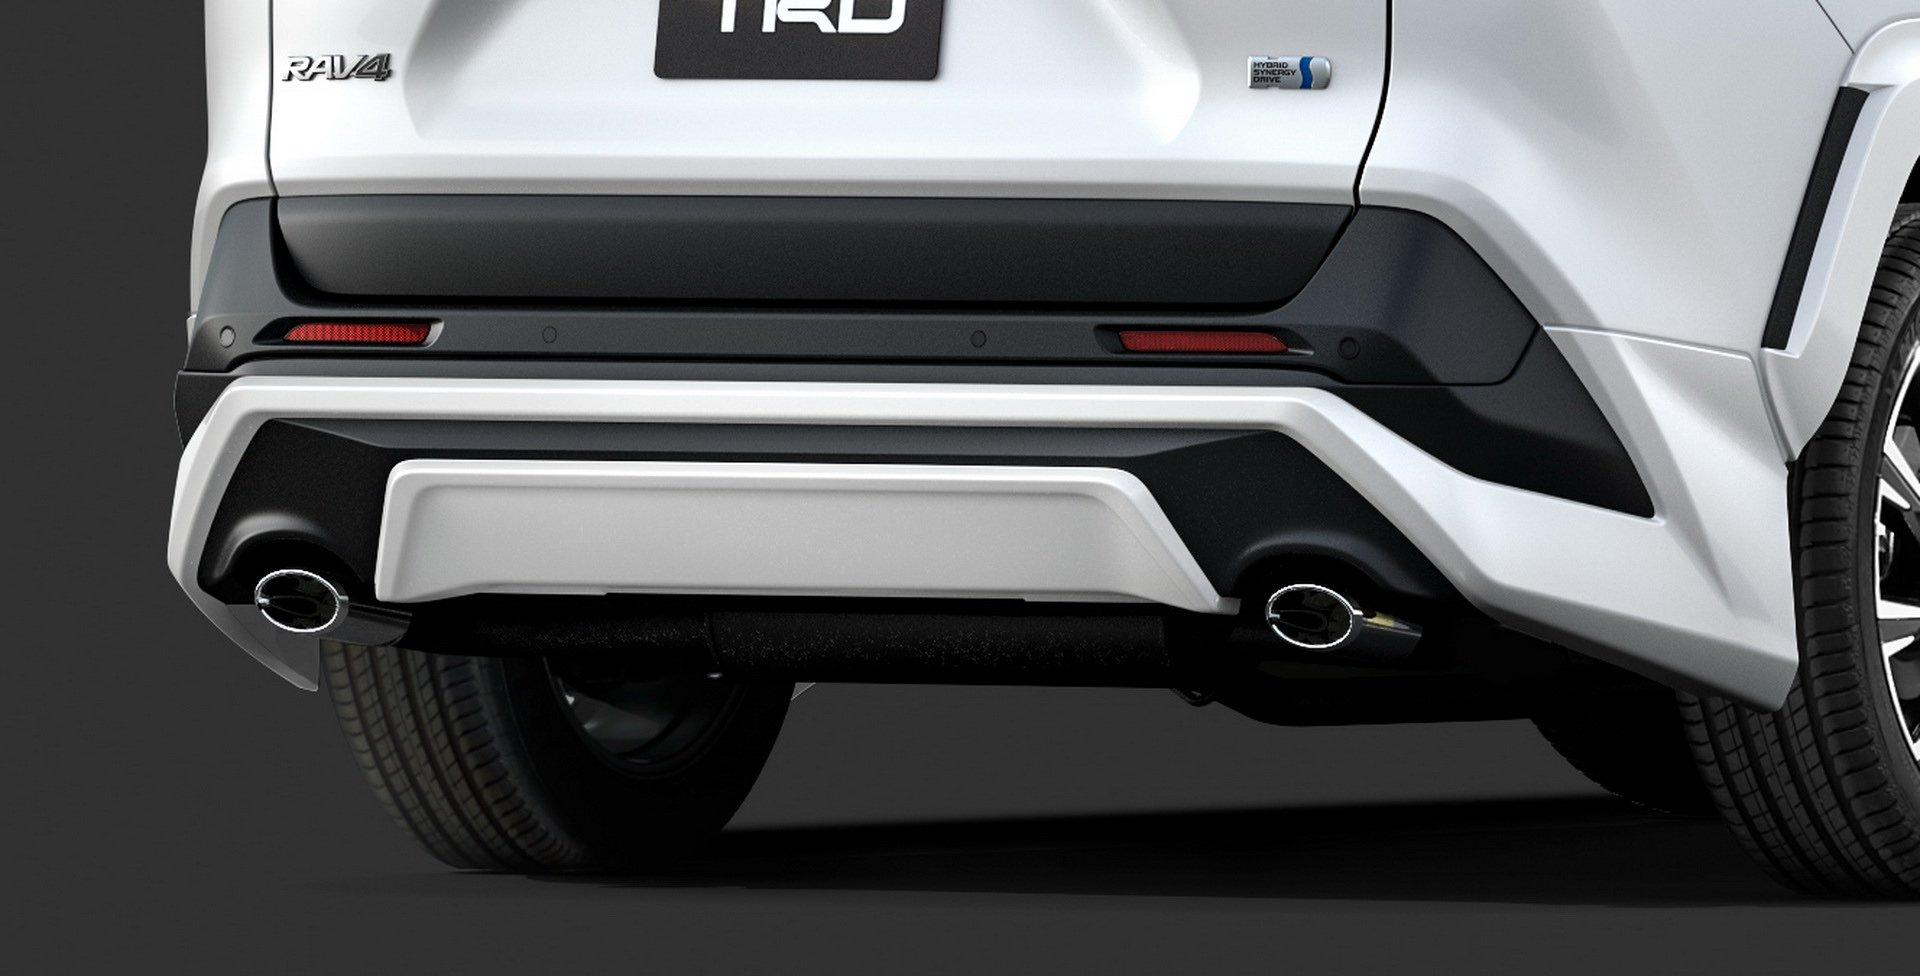 Toyota-RAV4-TRD-and-Modellista-53